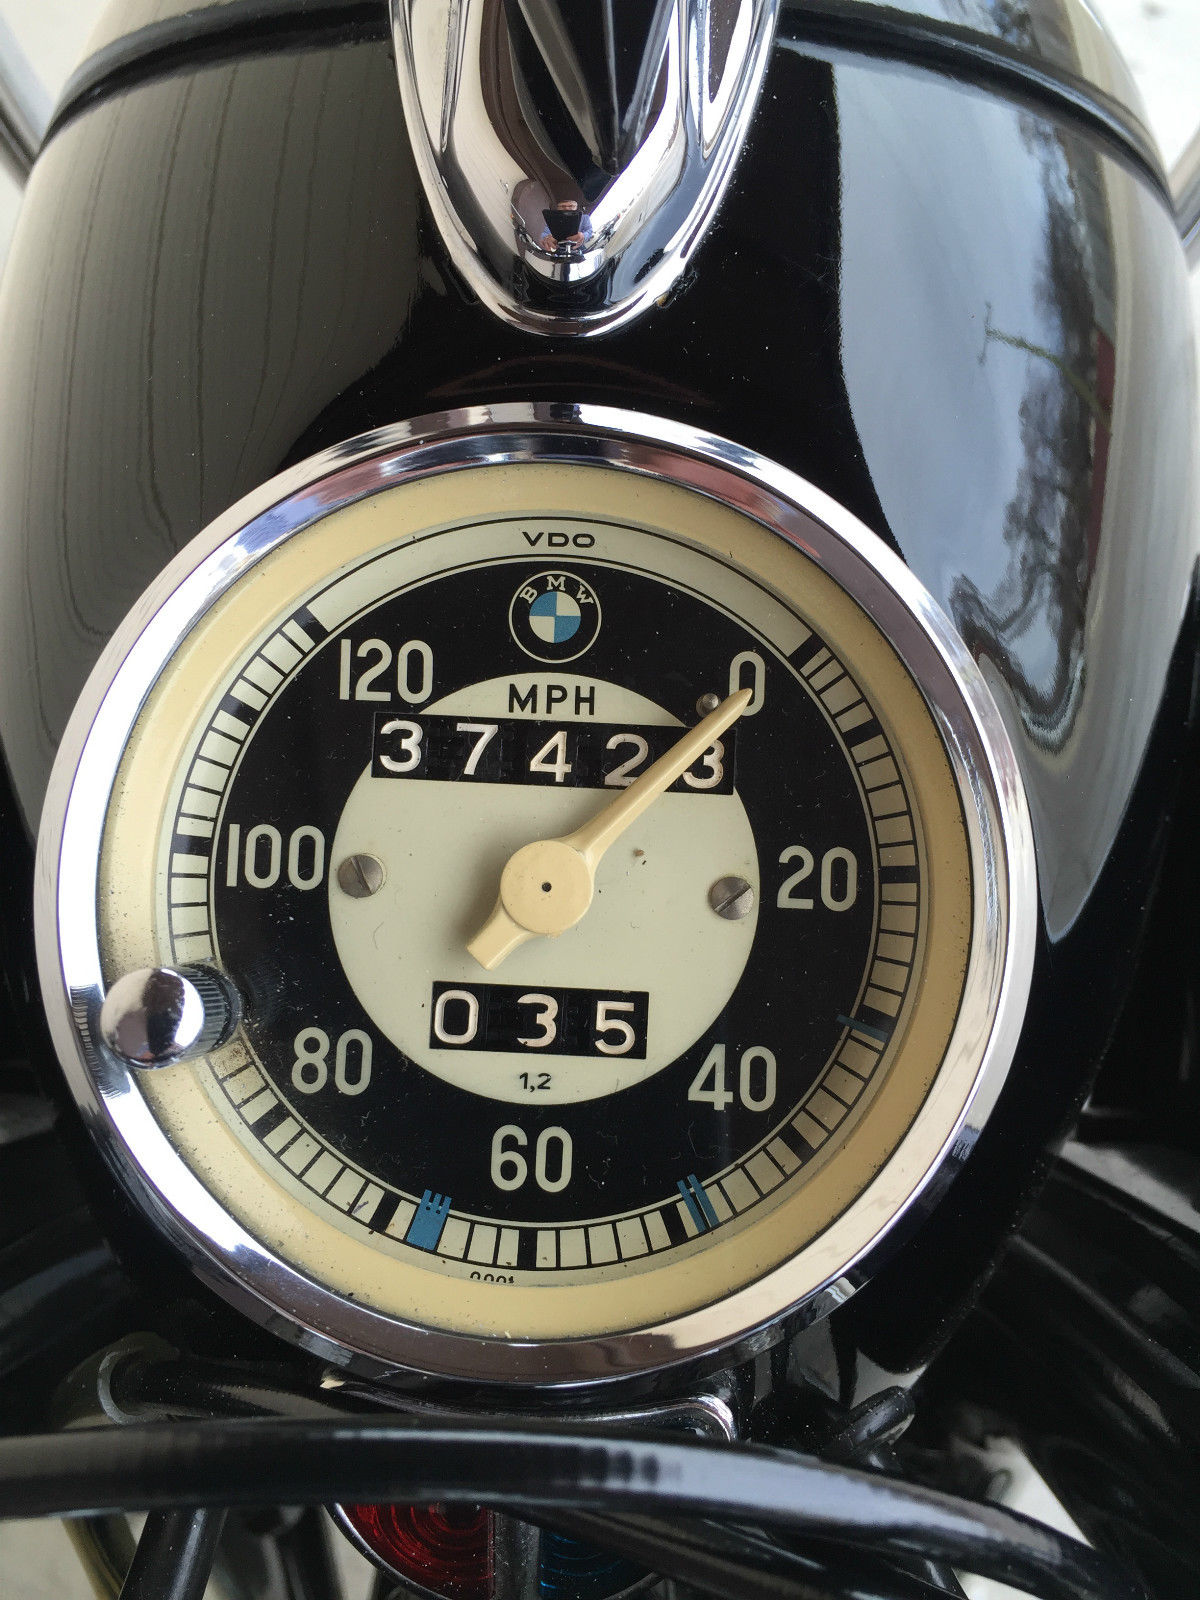 BMW R60/2 - 1965 - Speedometer.